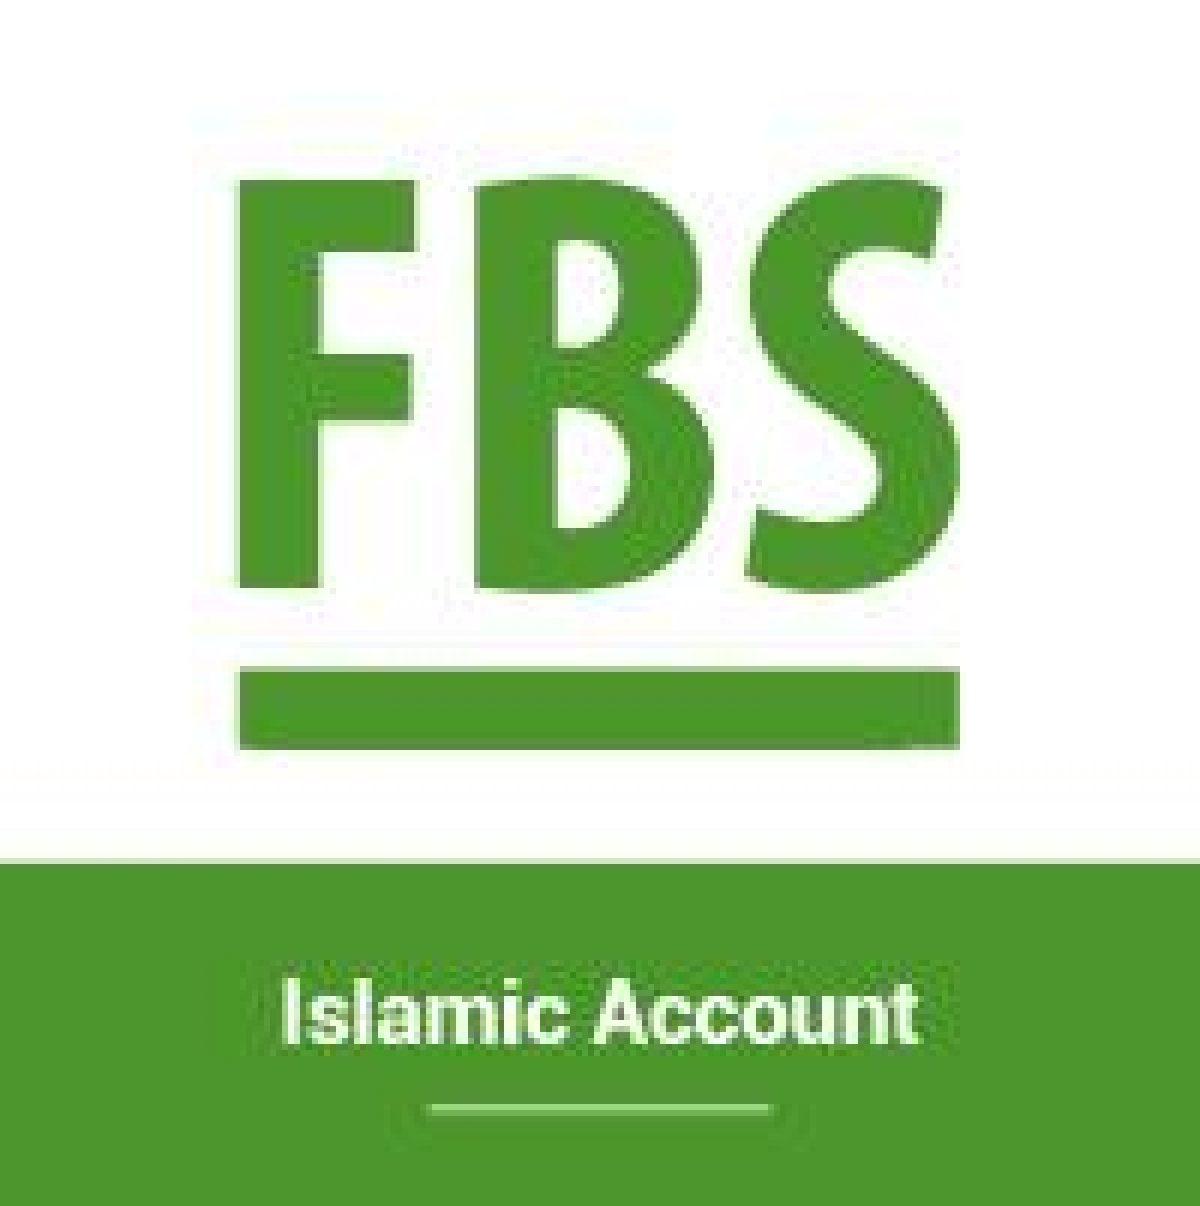 fbs crypto